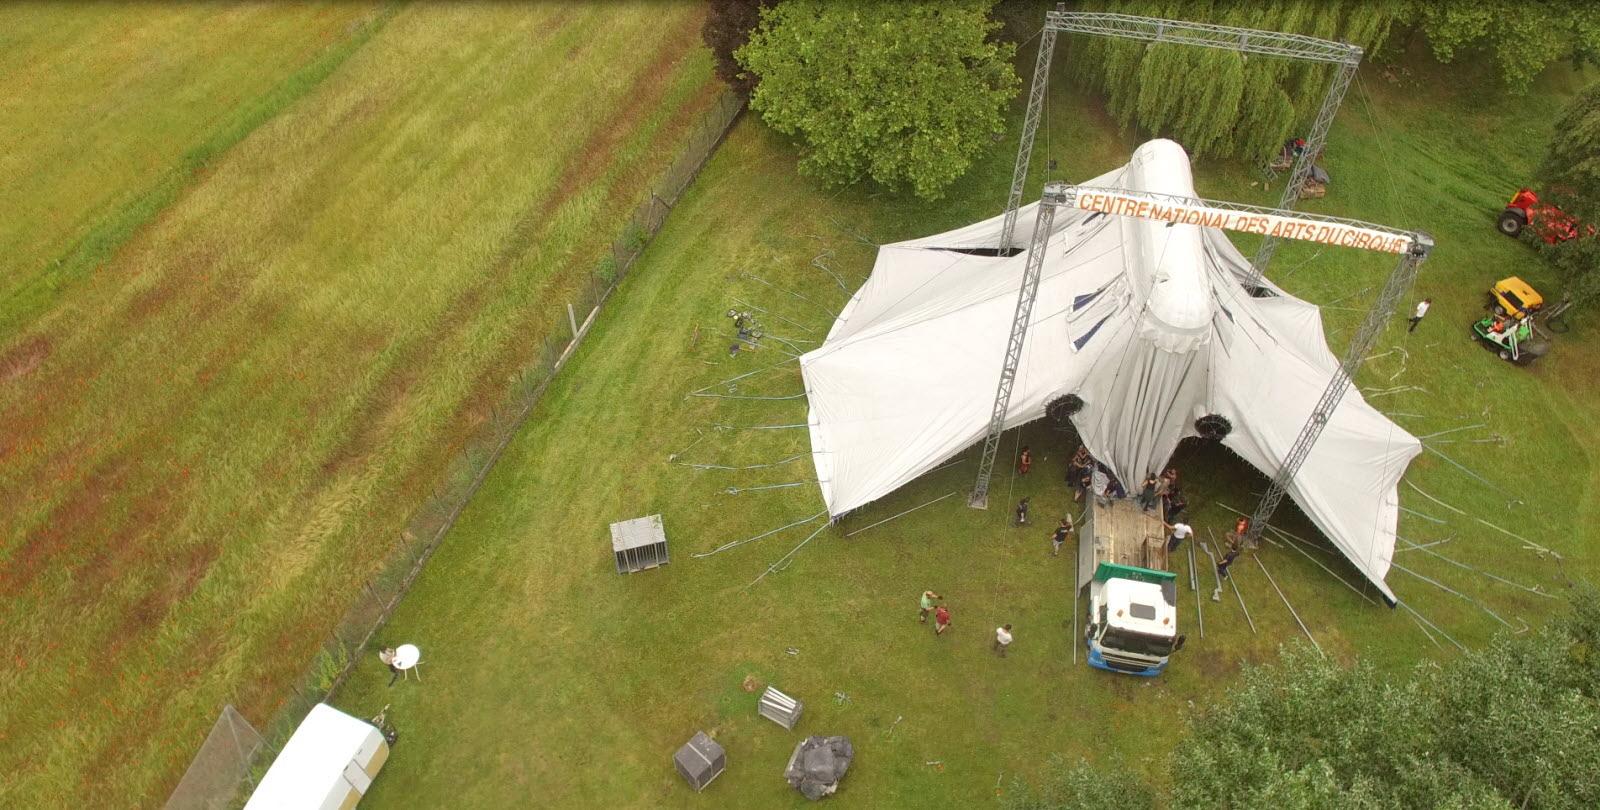 drone cirque Montigny Les Metz